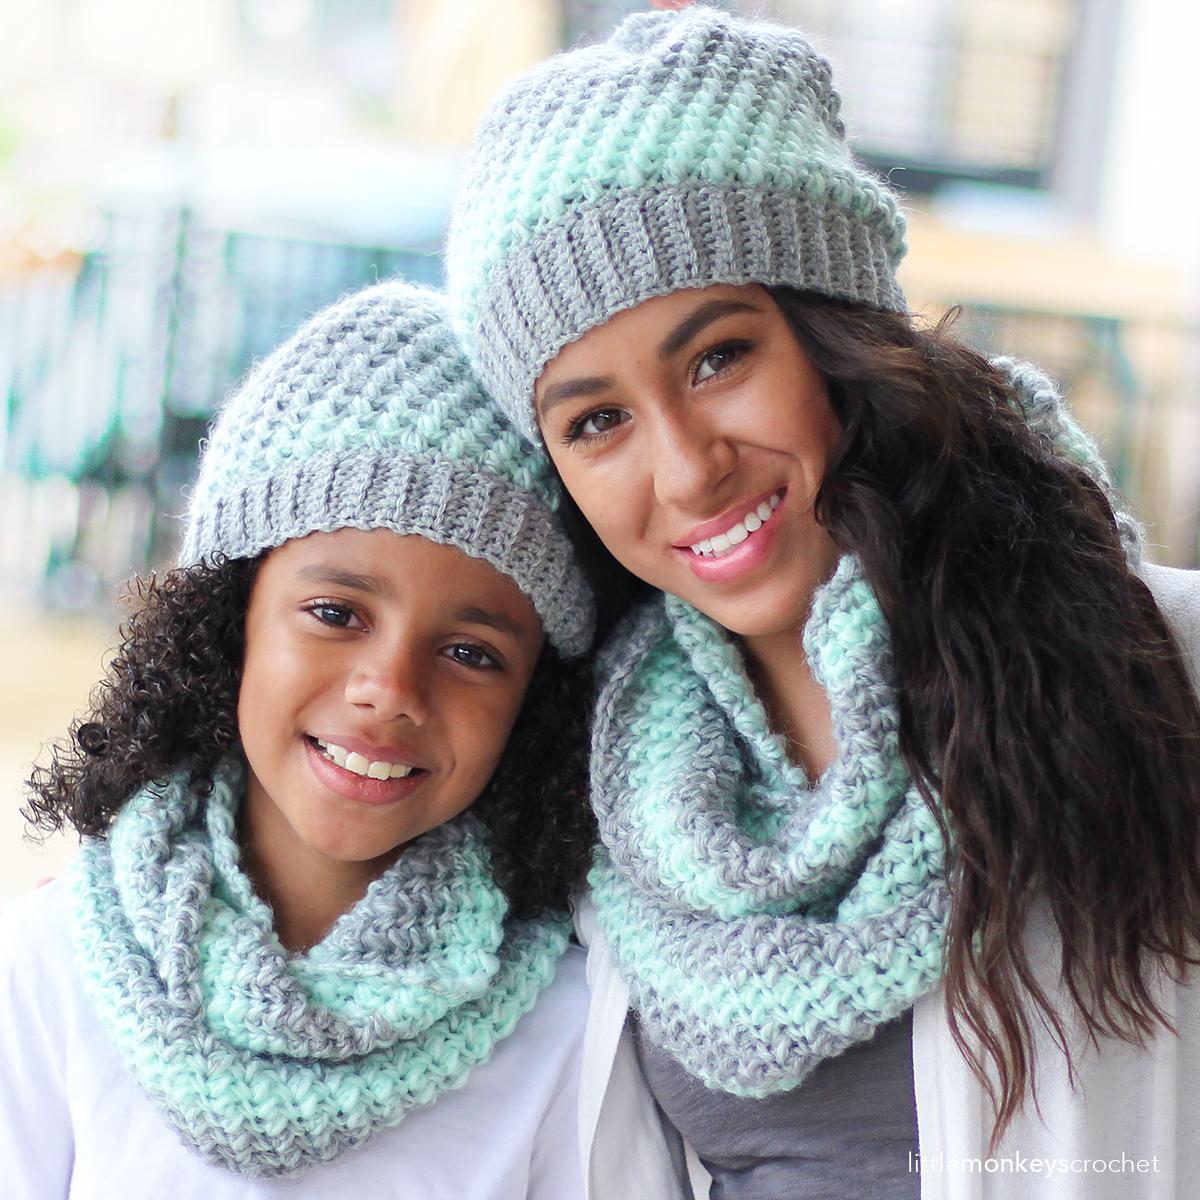 Landon Slouch Hat Scarf Crochet Pattern Set Yarn Chai